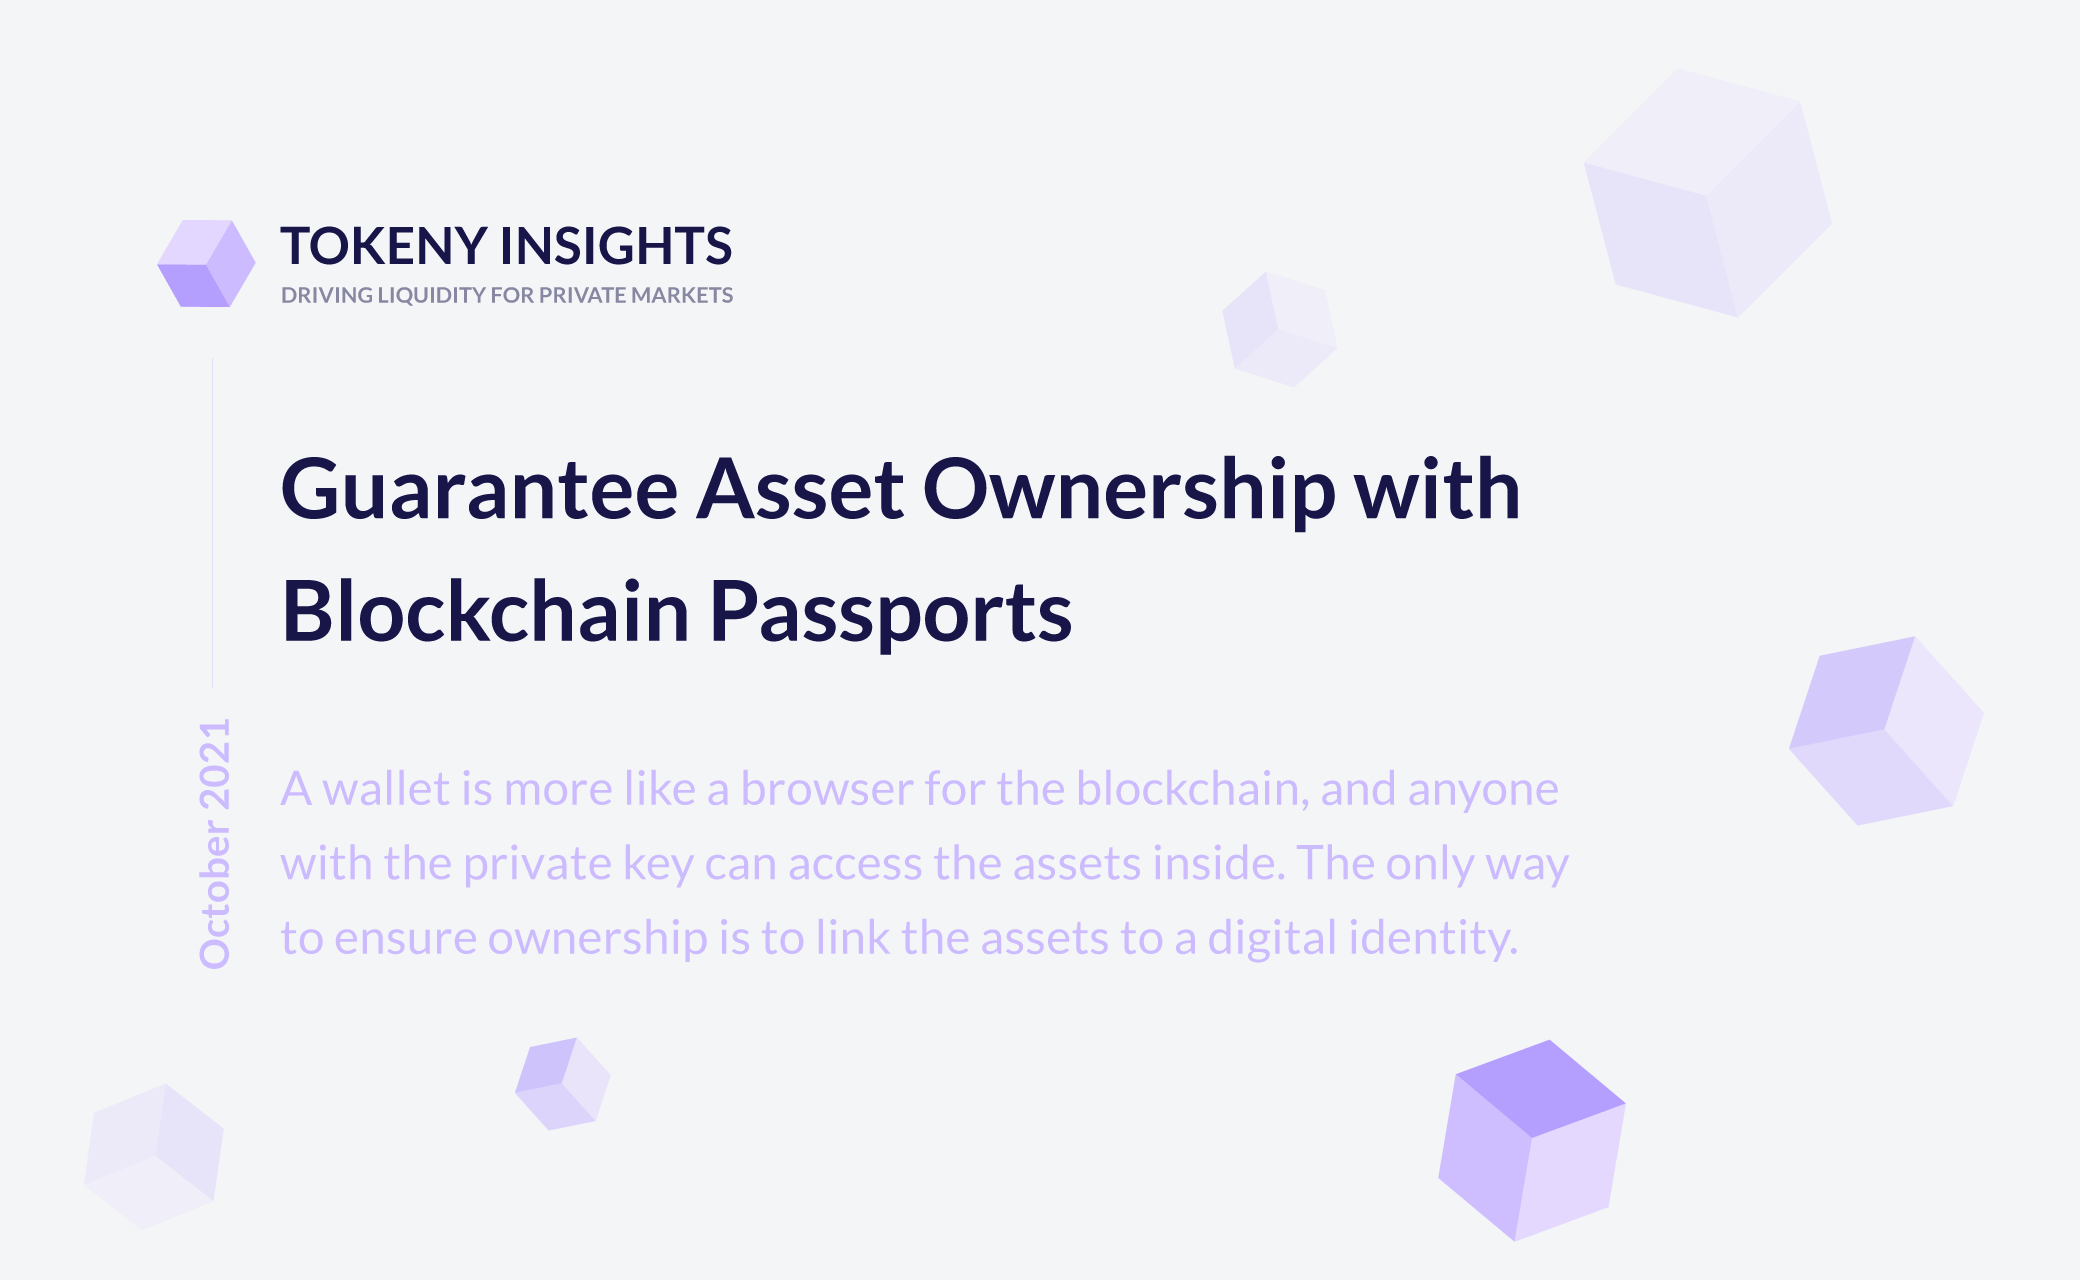 Digital identity - Blockchain passport